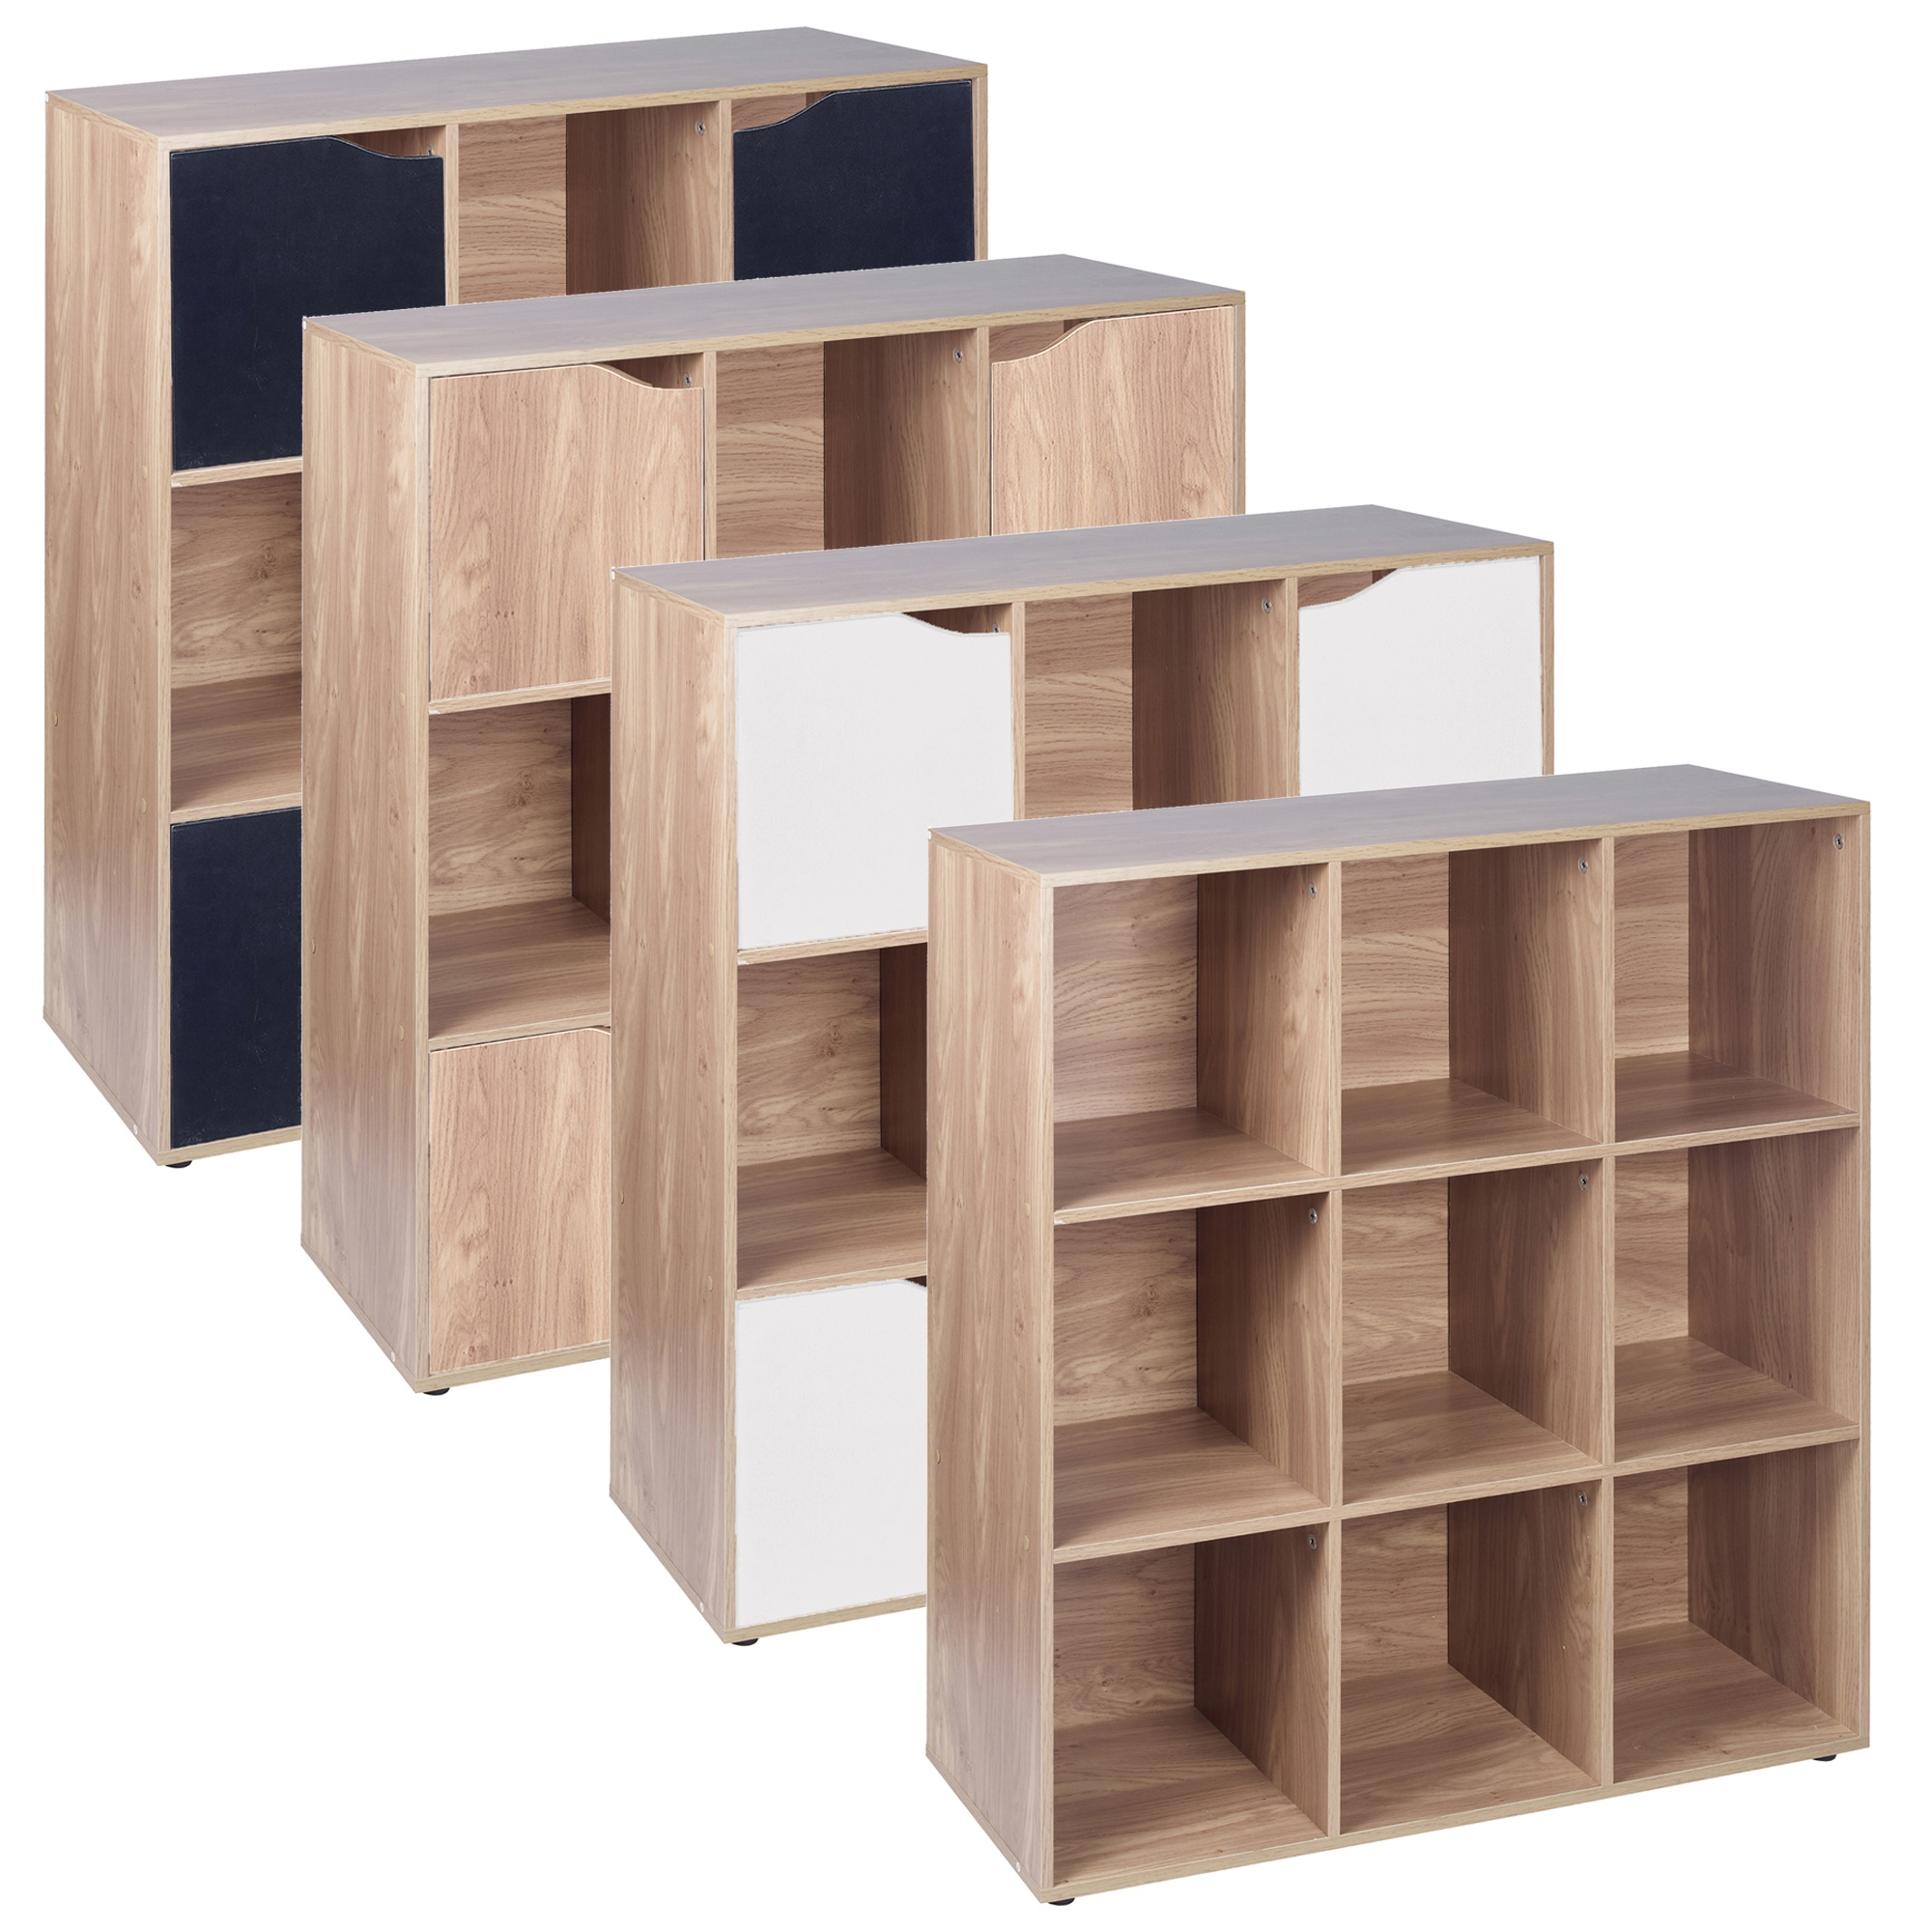 9 Cube Oak Wooden Bookcase Shelving Display Modular